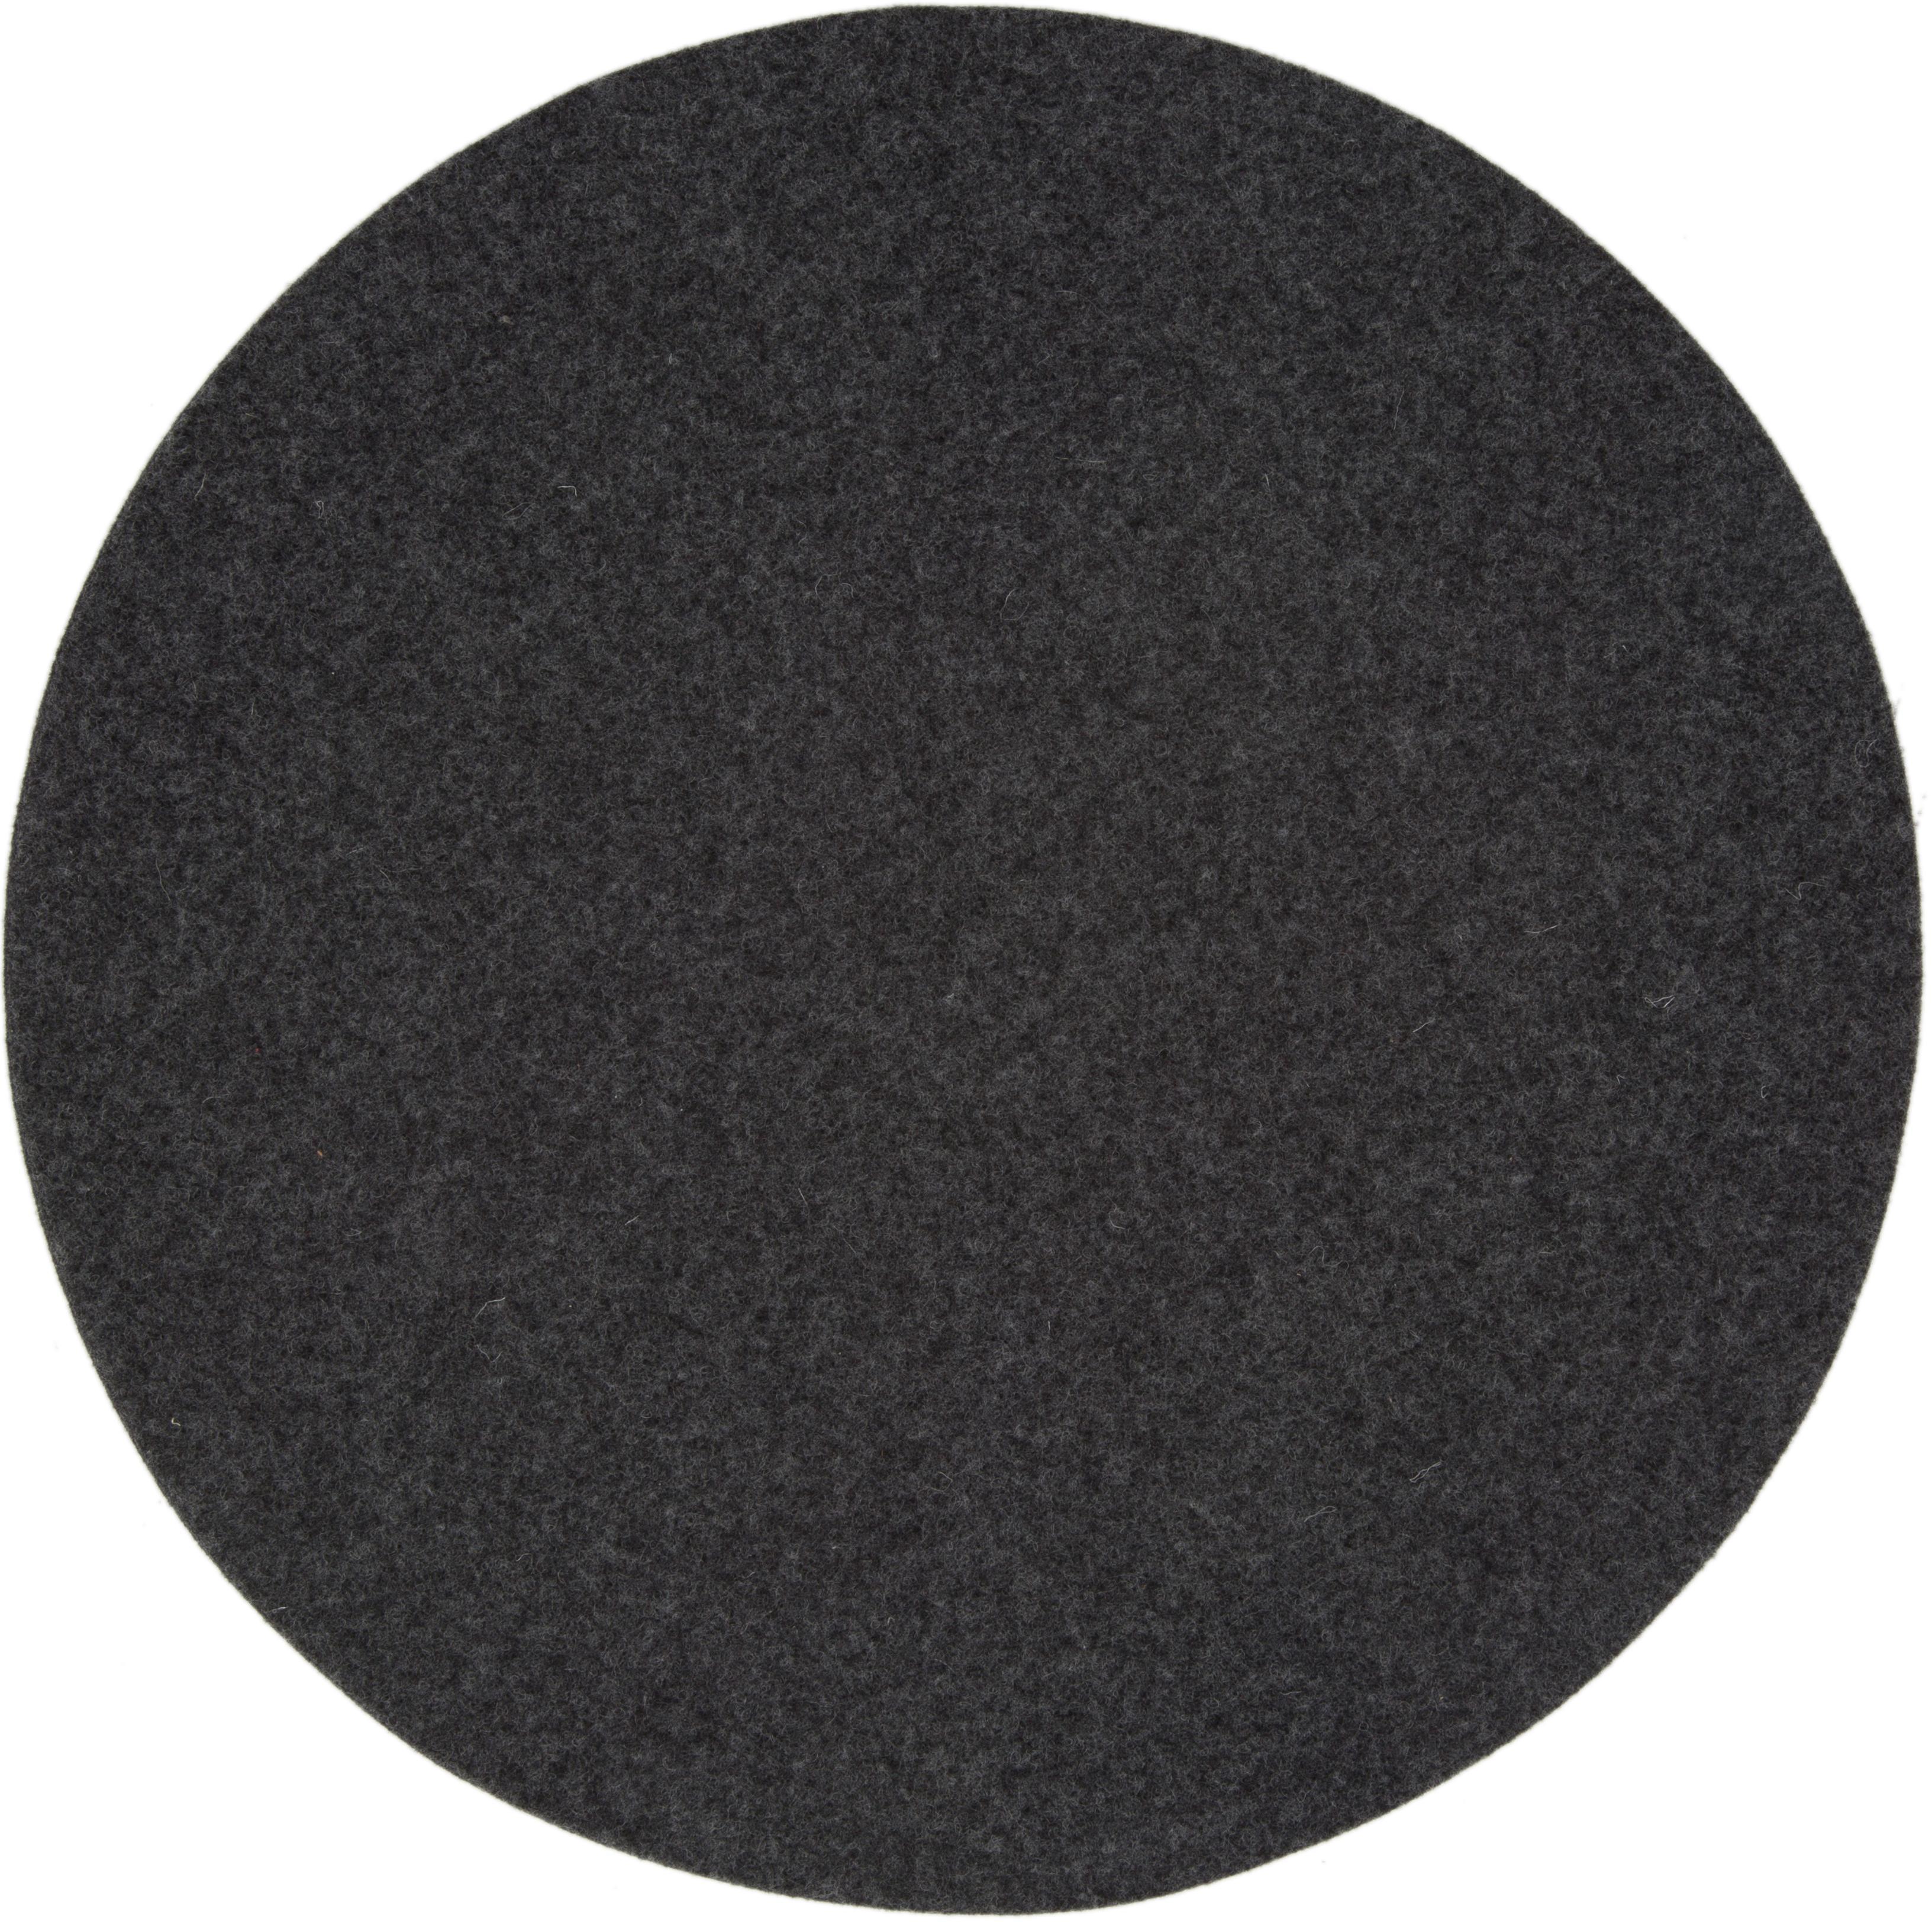 Ronde wolvilt placemats Leandra, 4 stuks, 90% wol, 10% polyethyleen, Antraciet, Ø 40 cm